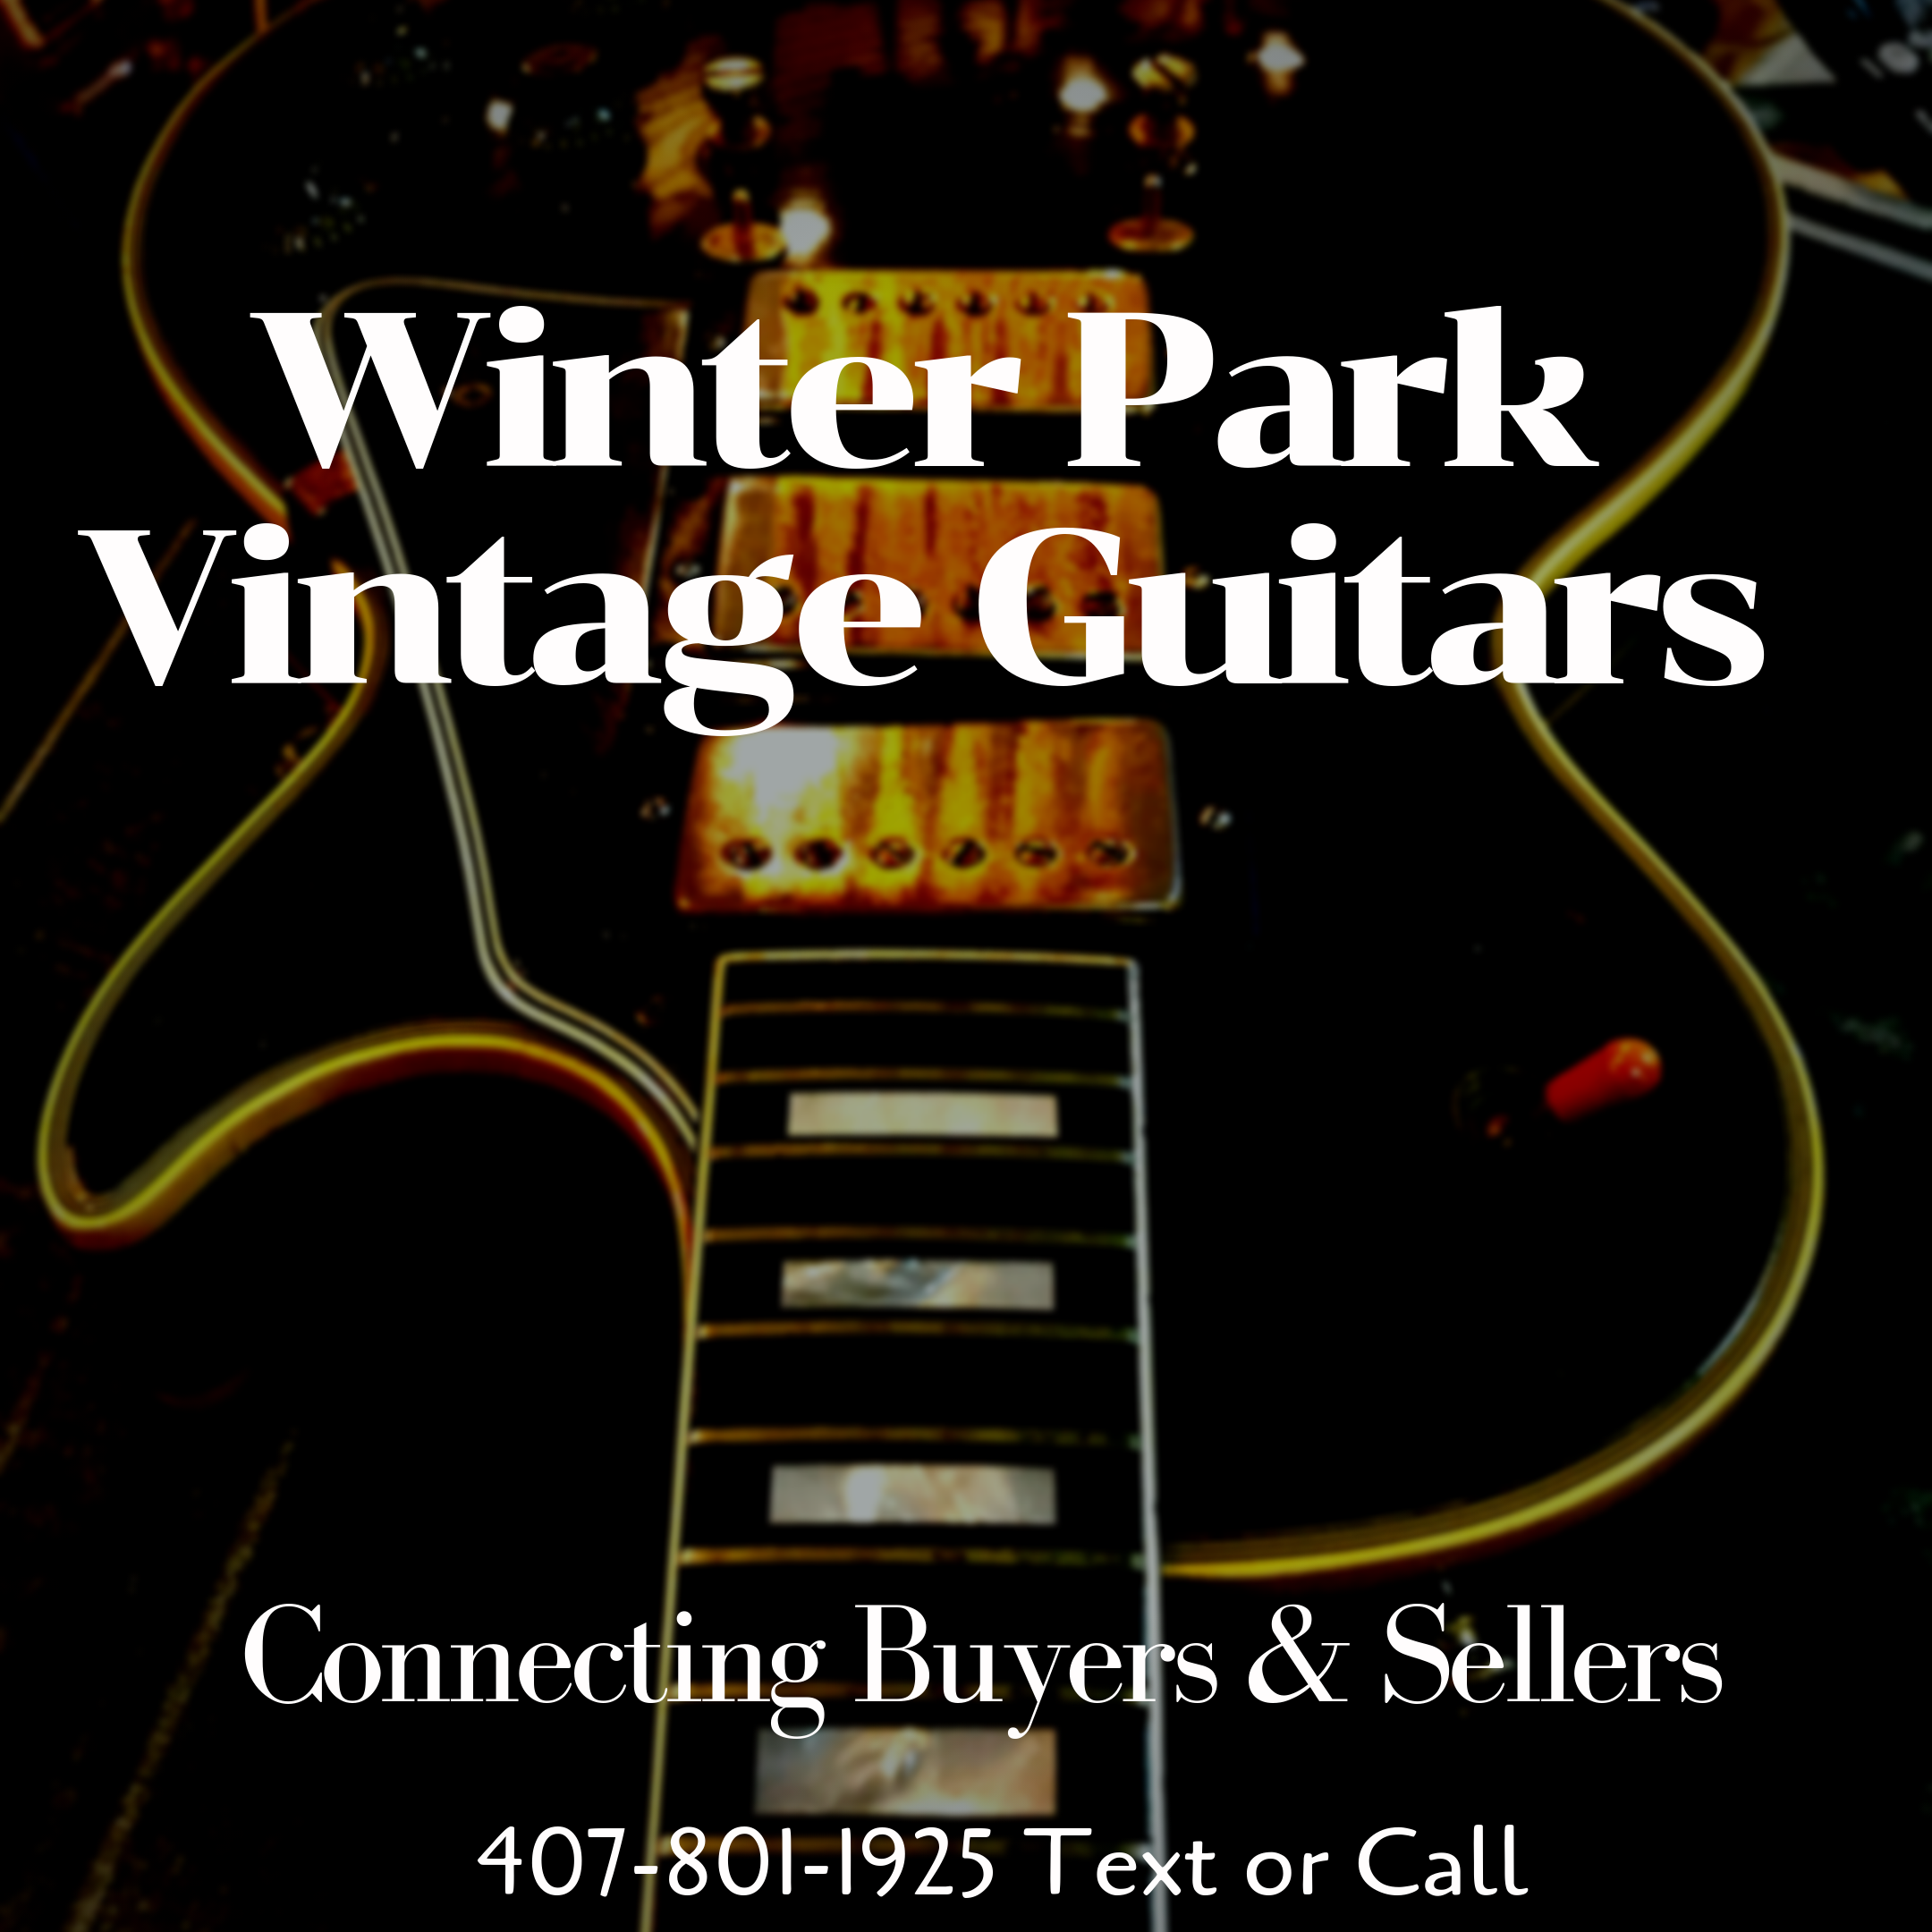 Winter Park Vintage Guitars-3.png